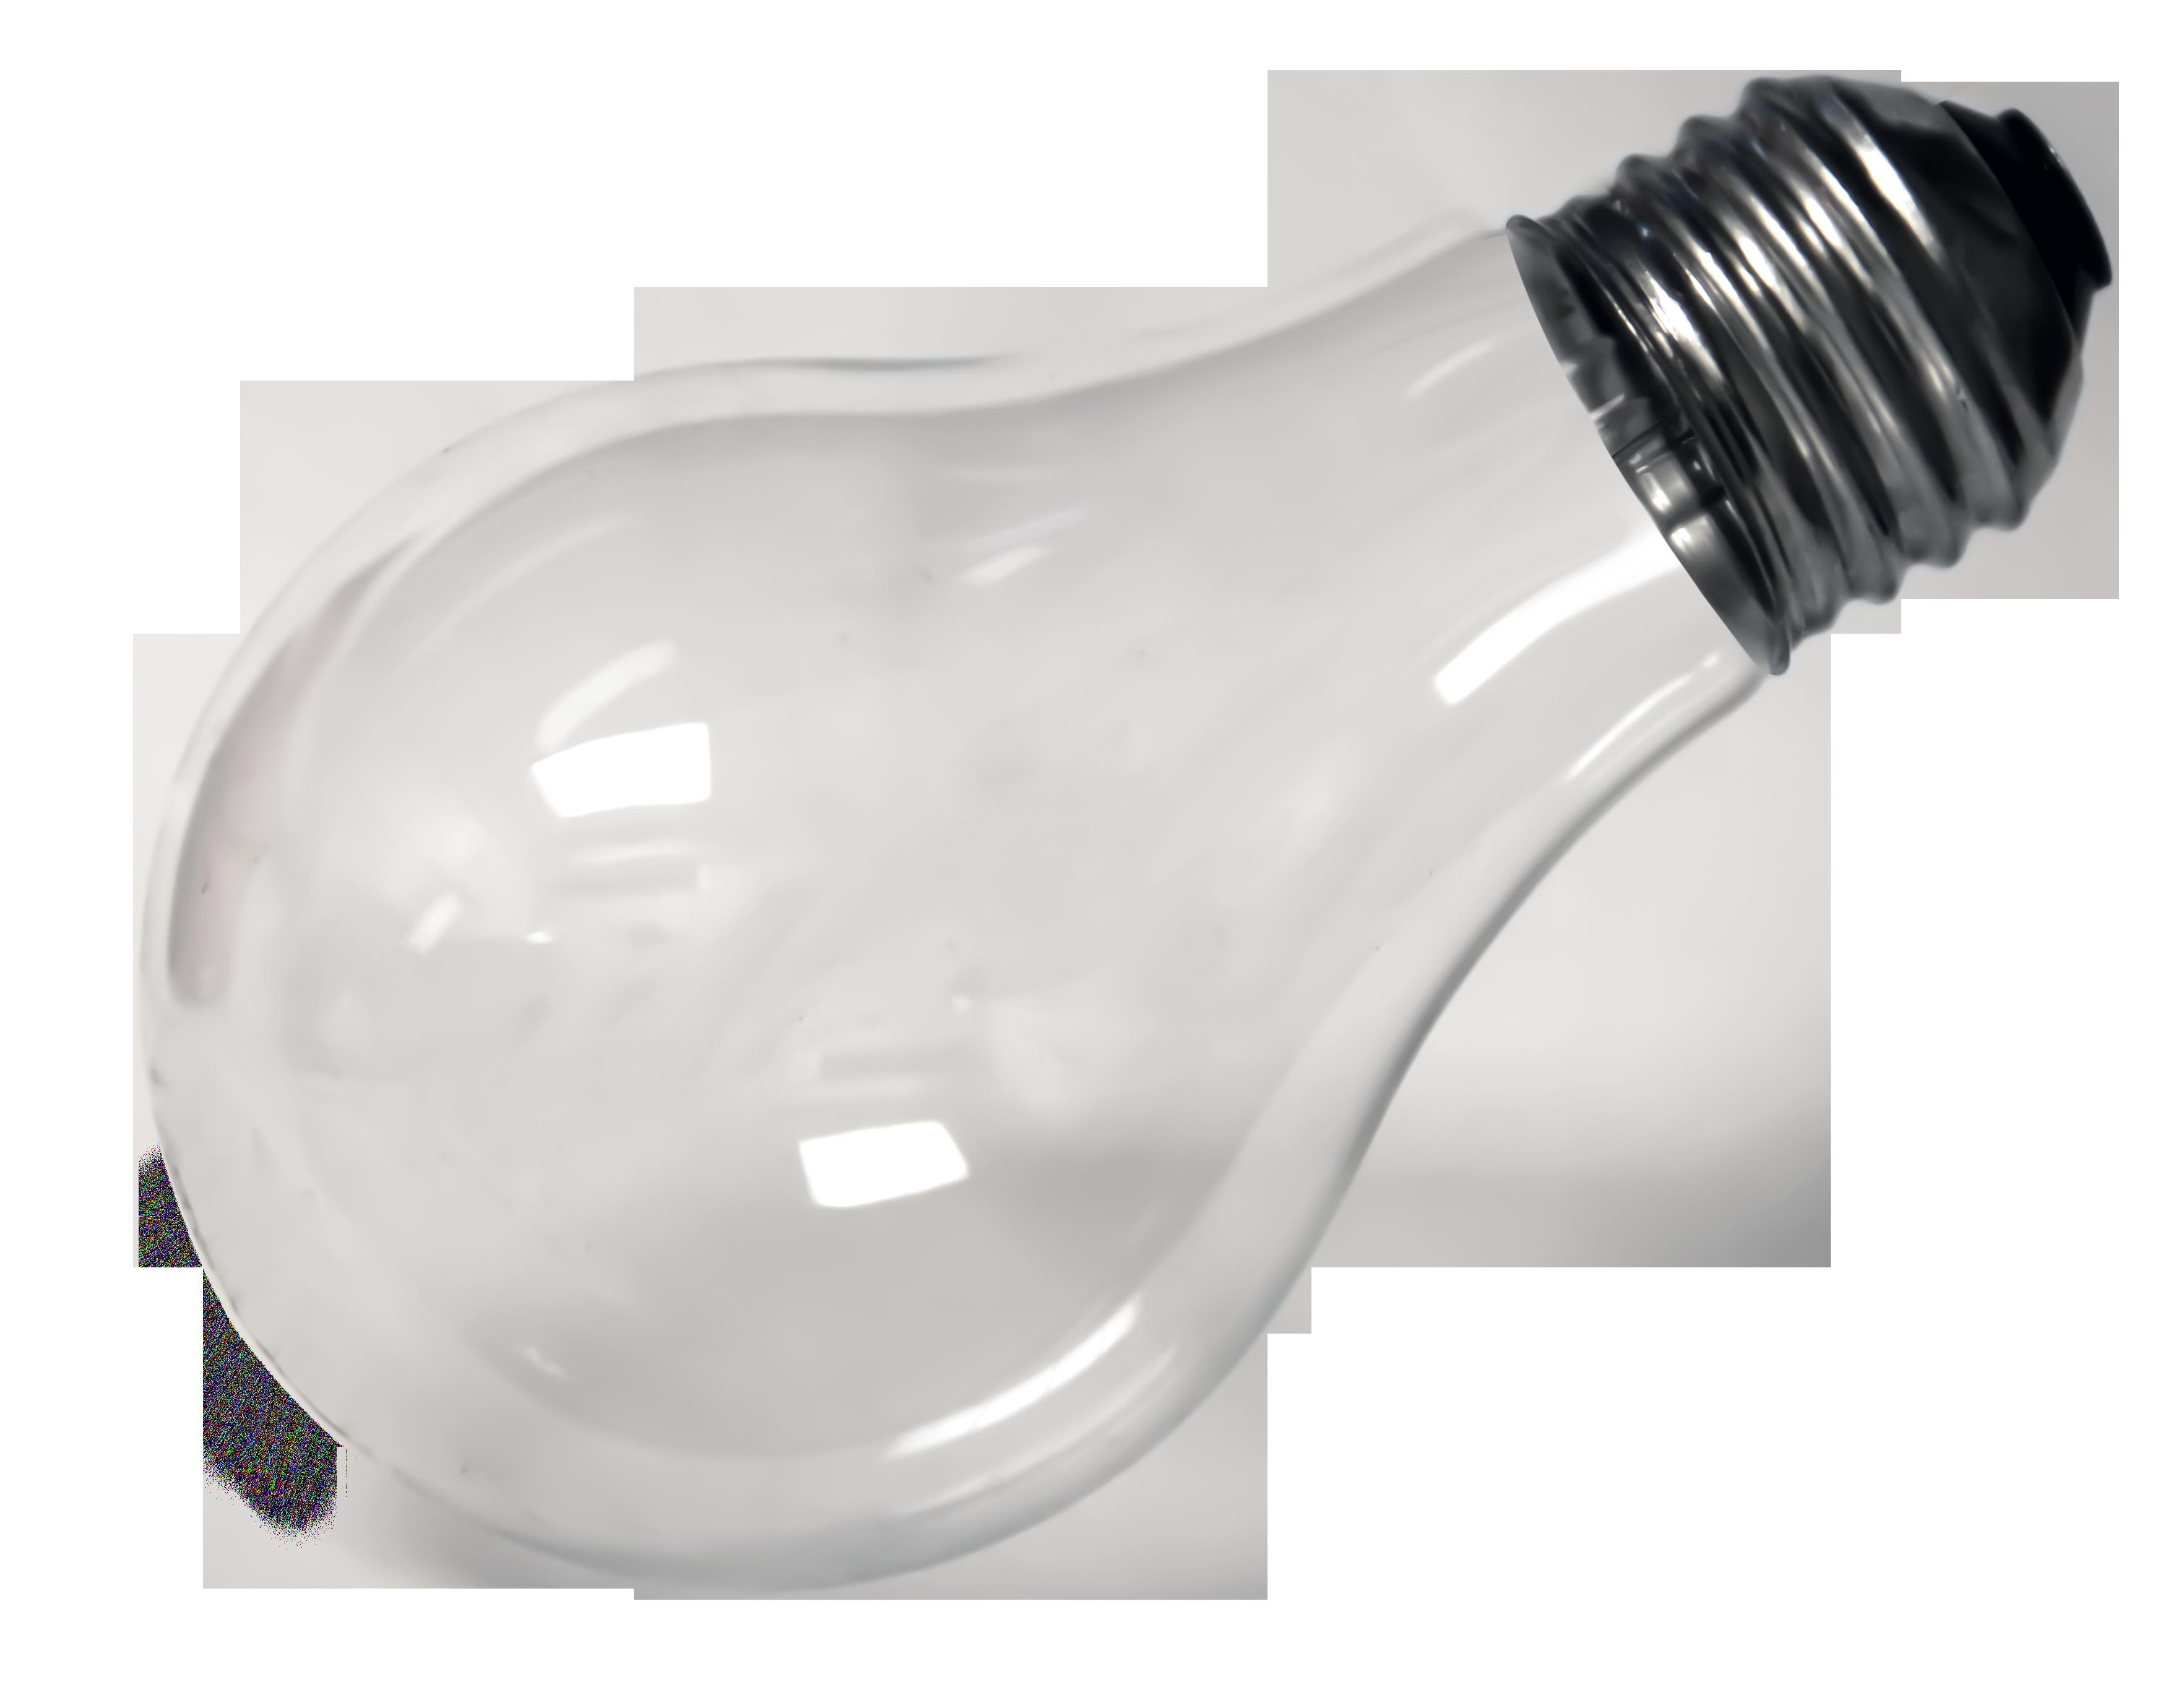 Lightbulb HD PNG - 118940